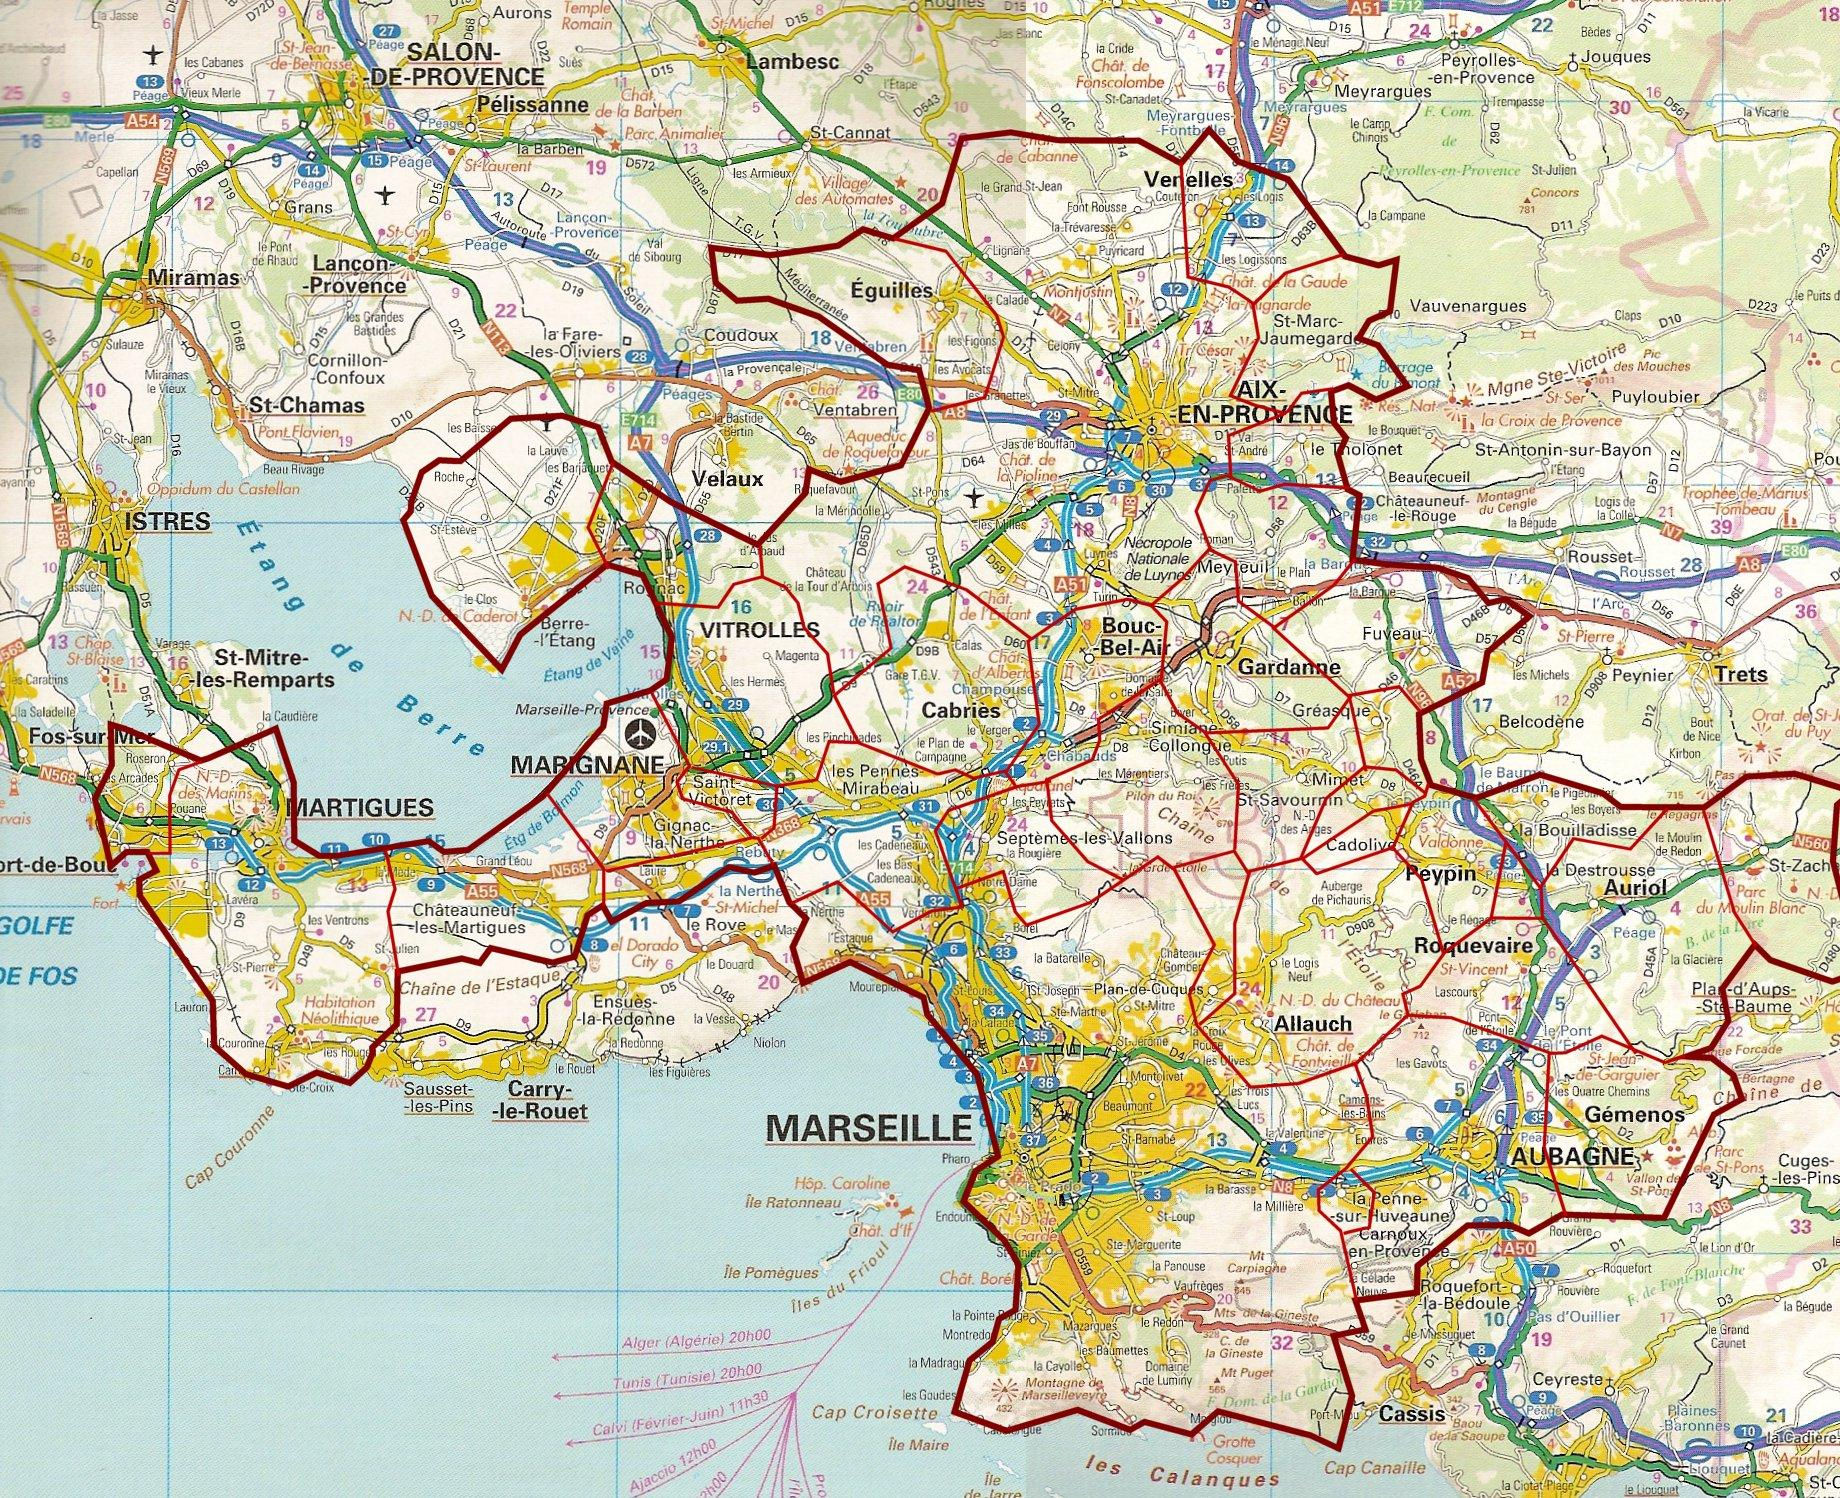 Marseille road map - Map of Marseille road (Provence-Alpes-Côte d'Azur - France)